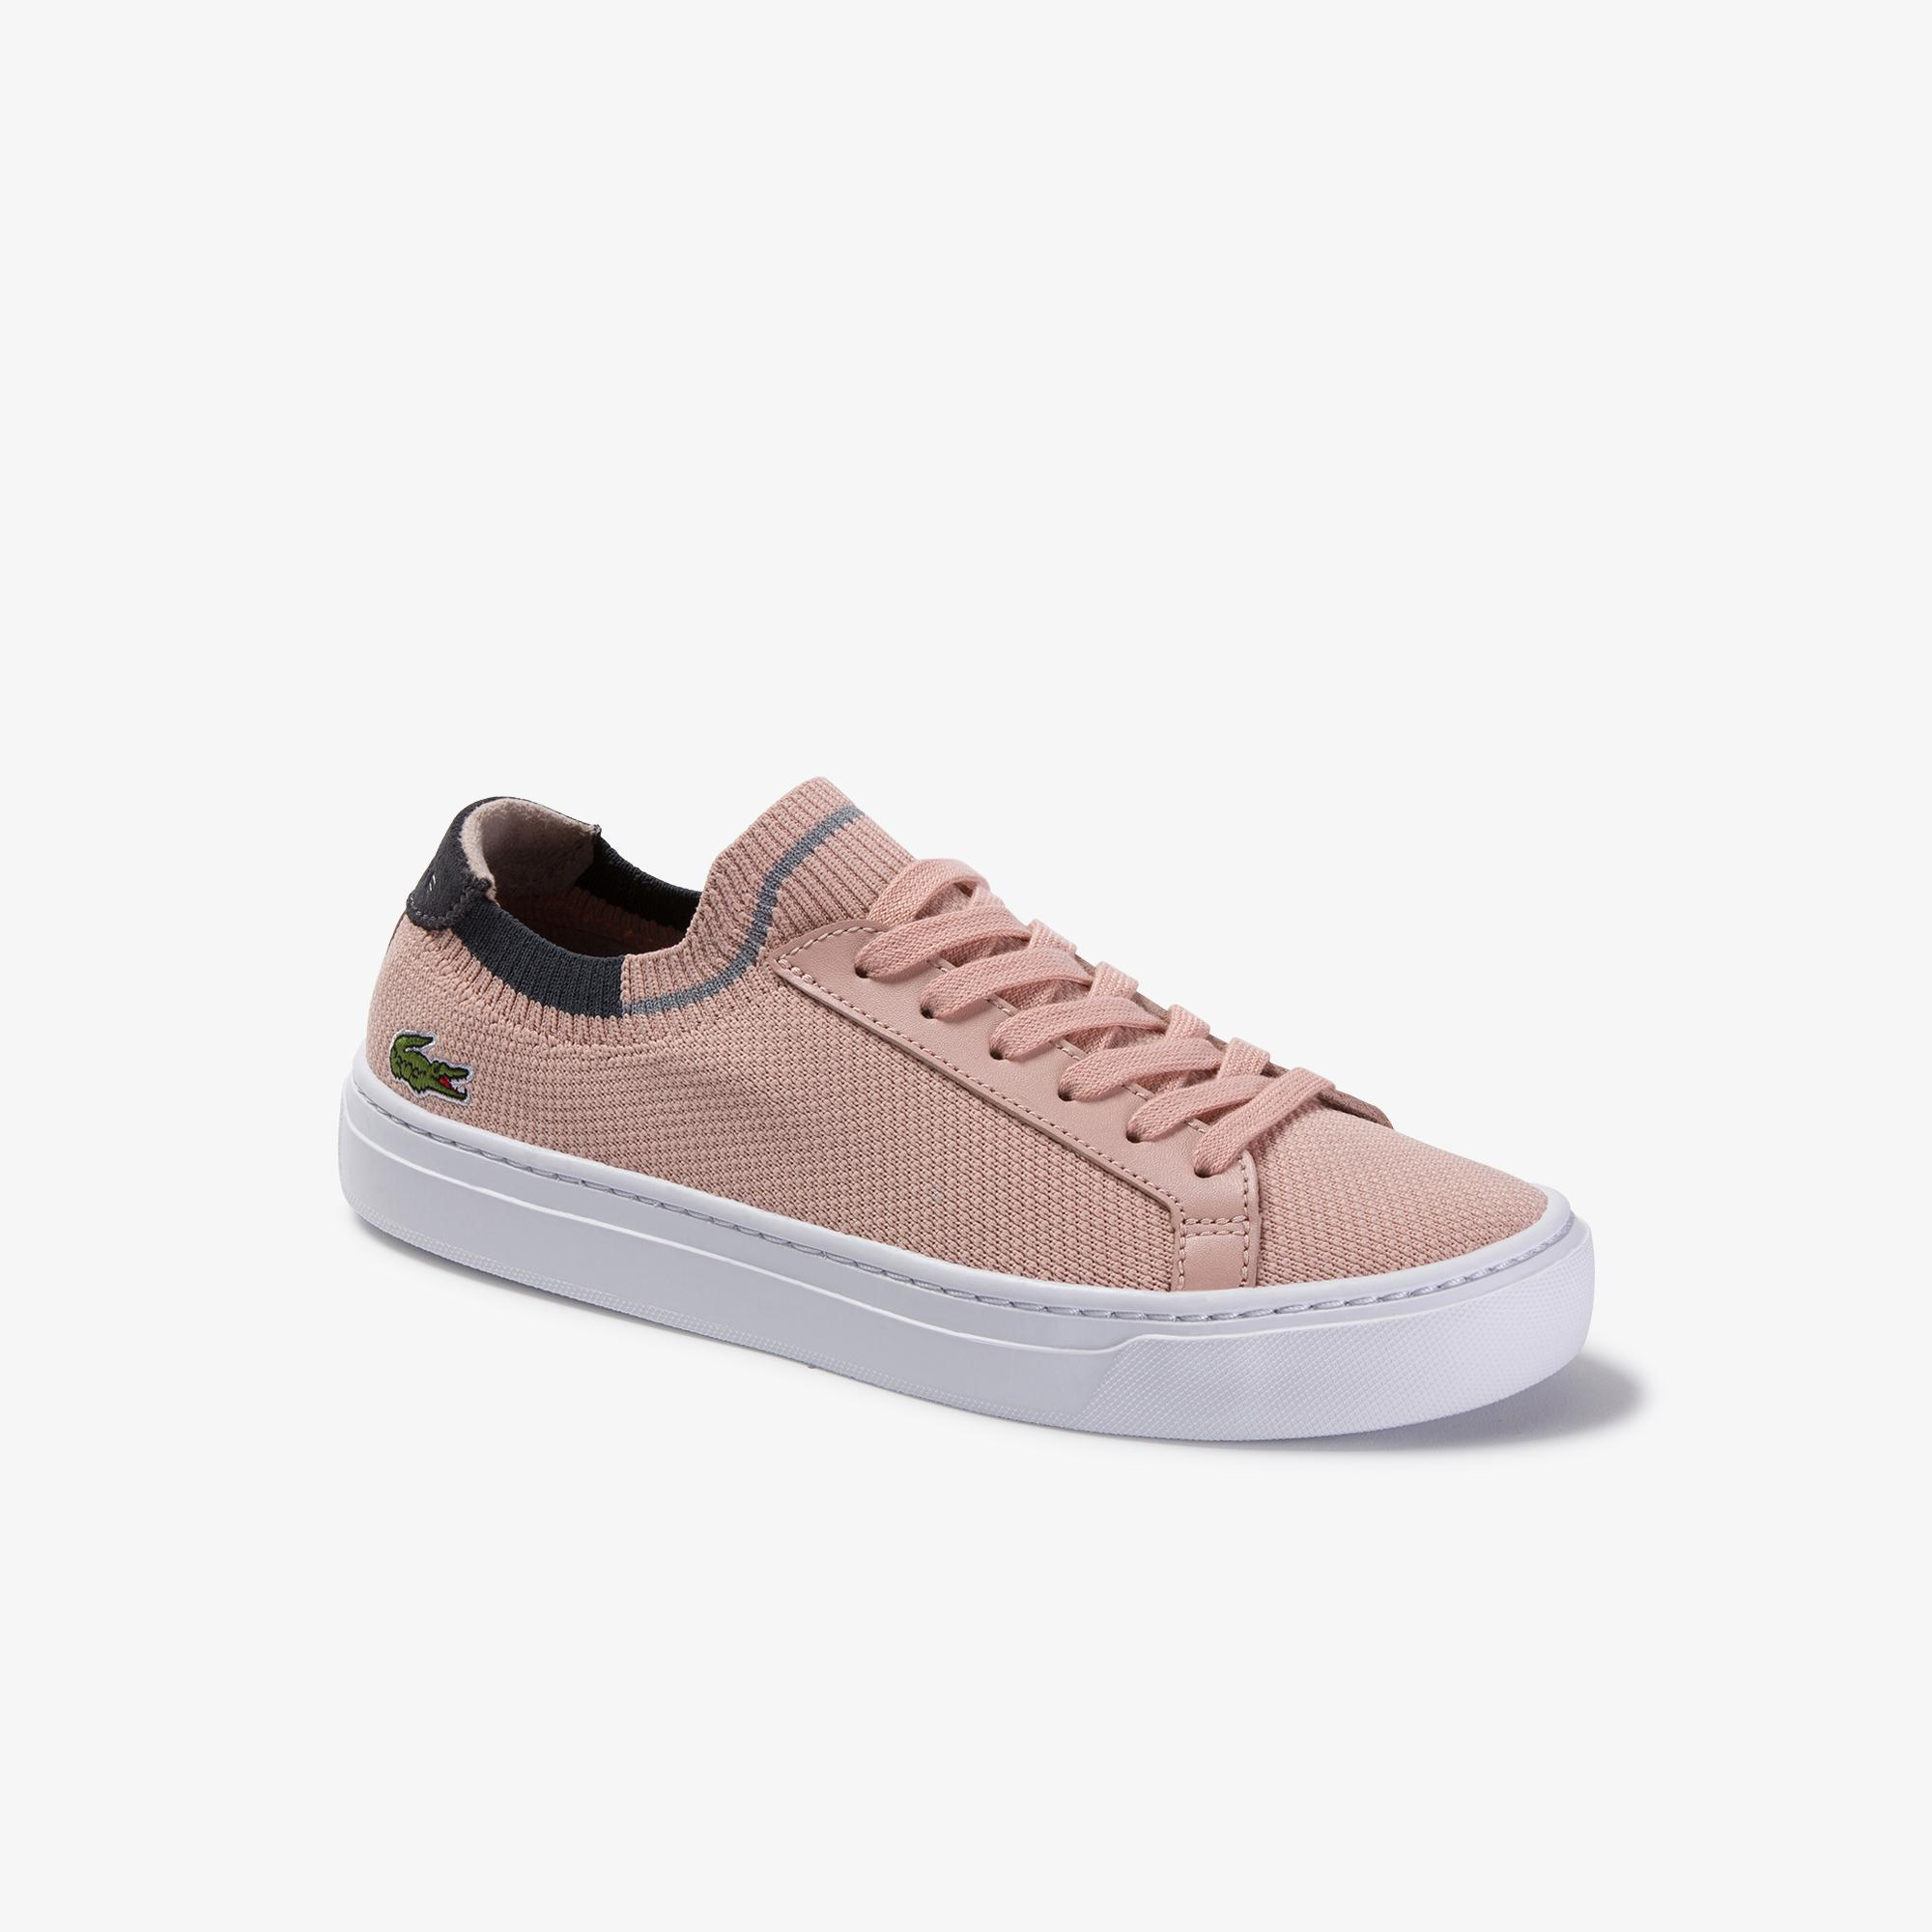 Lacoste La Piquée 120 1 Damskie Textile Sneakersy